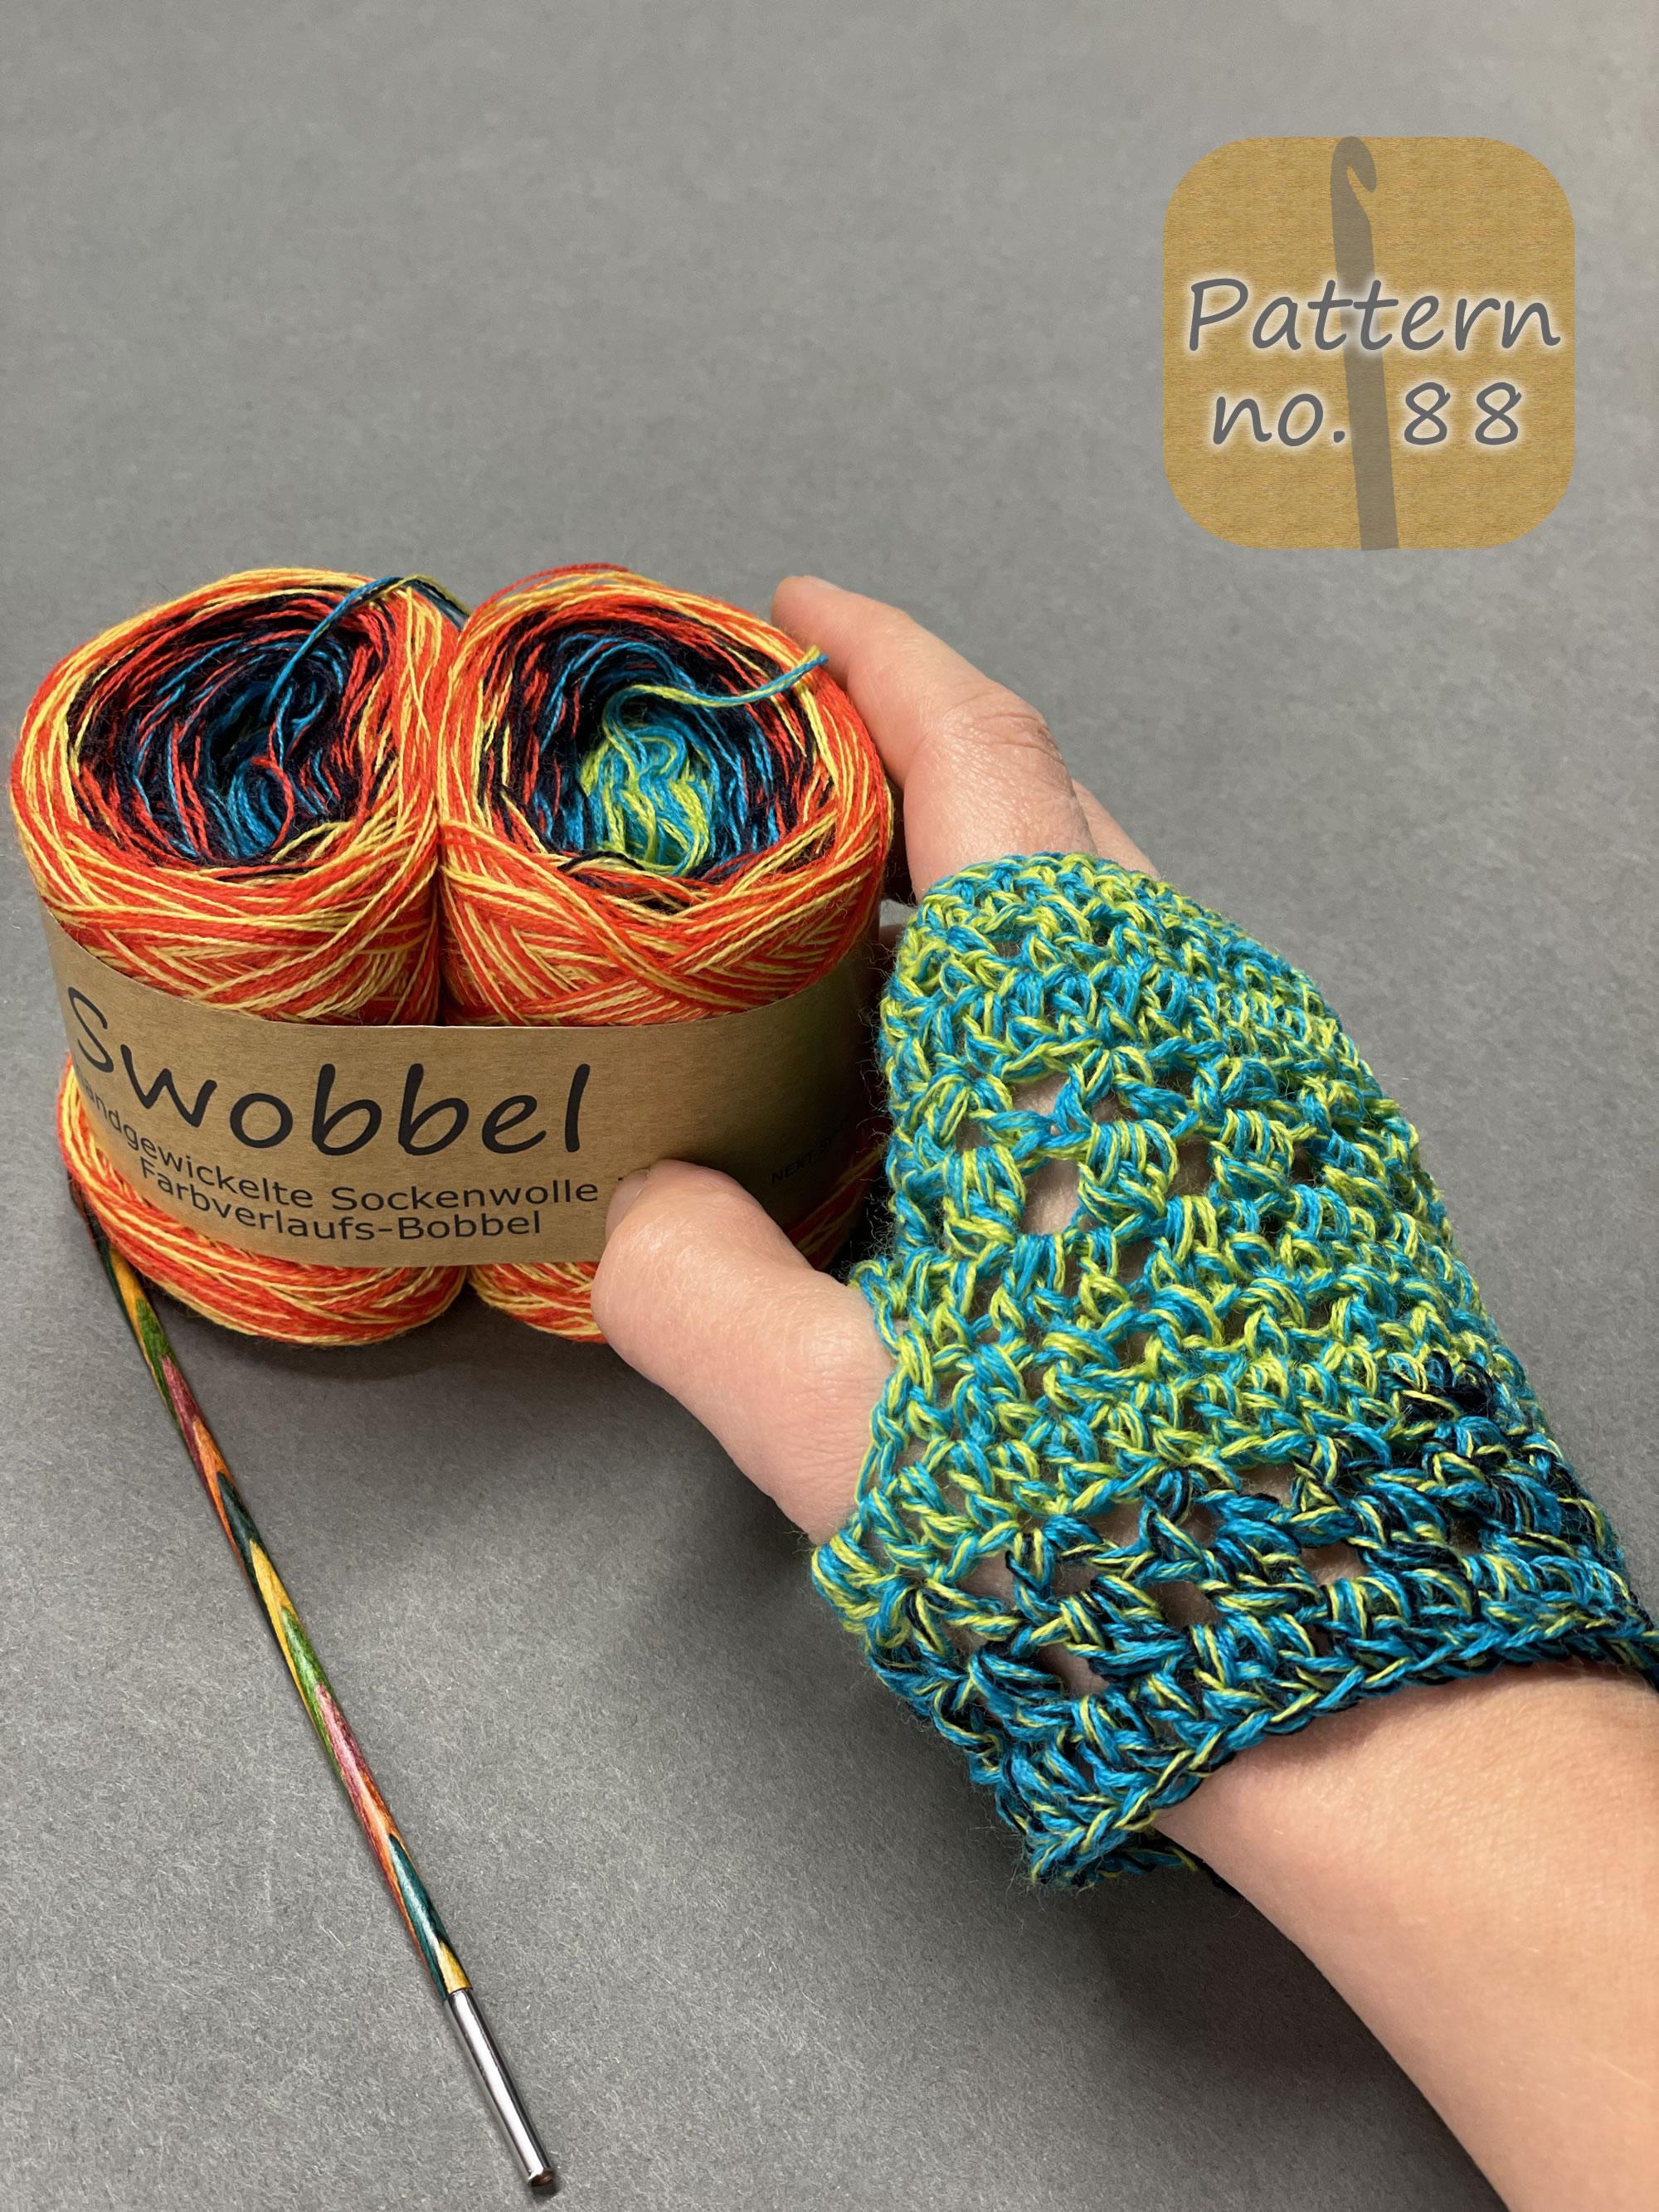 Swobbel Sockenwolle